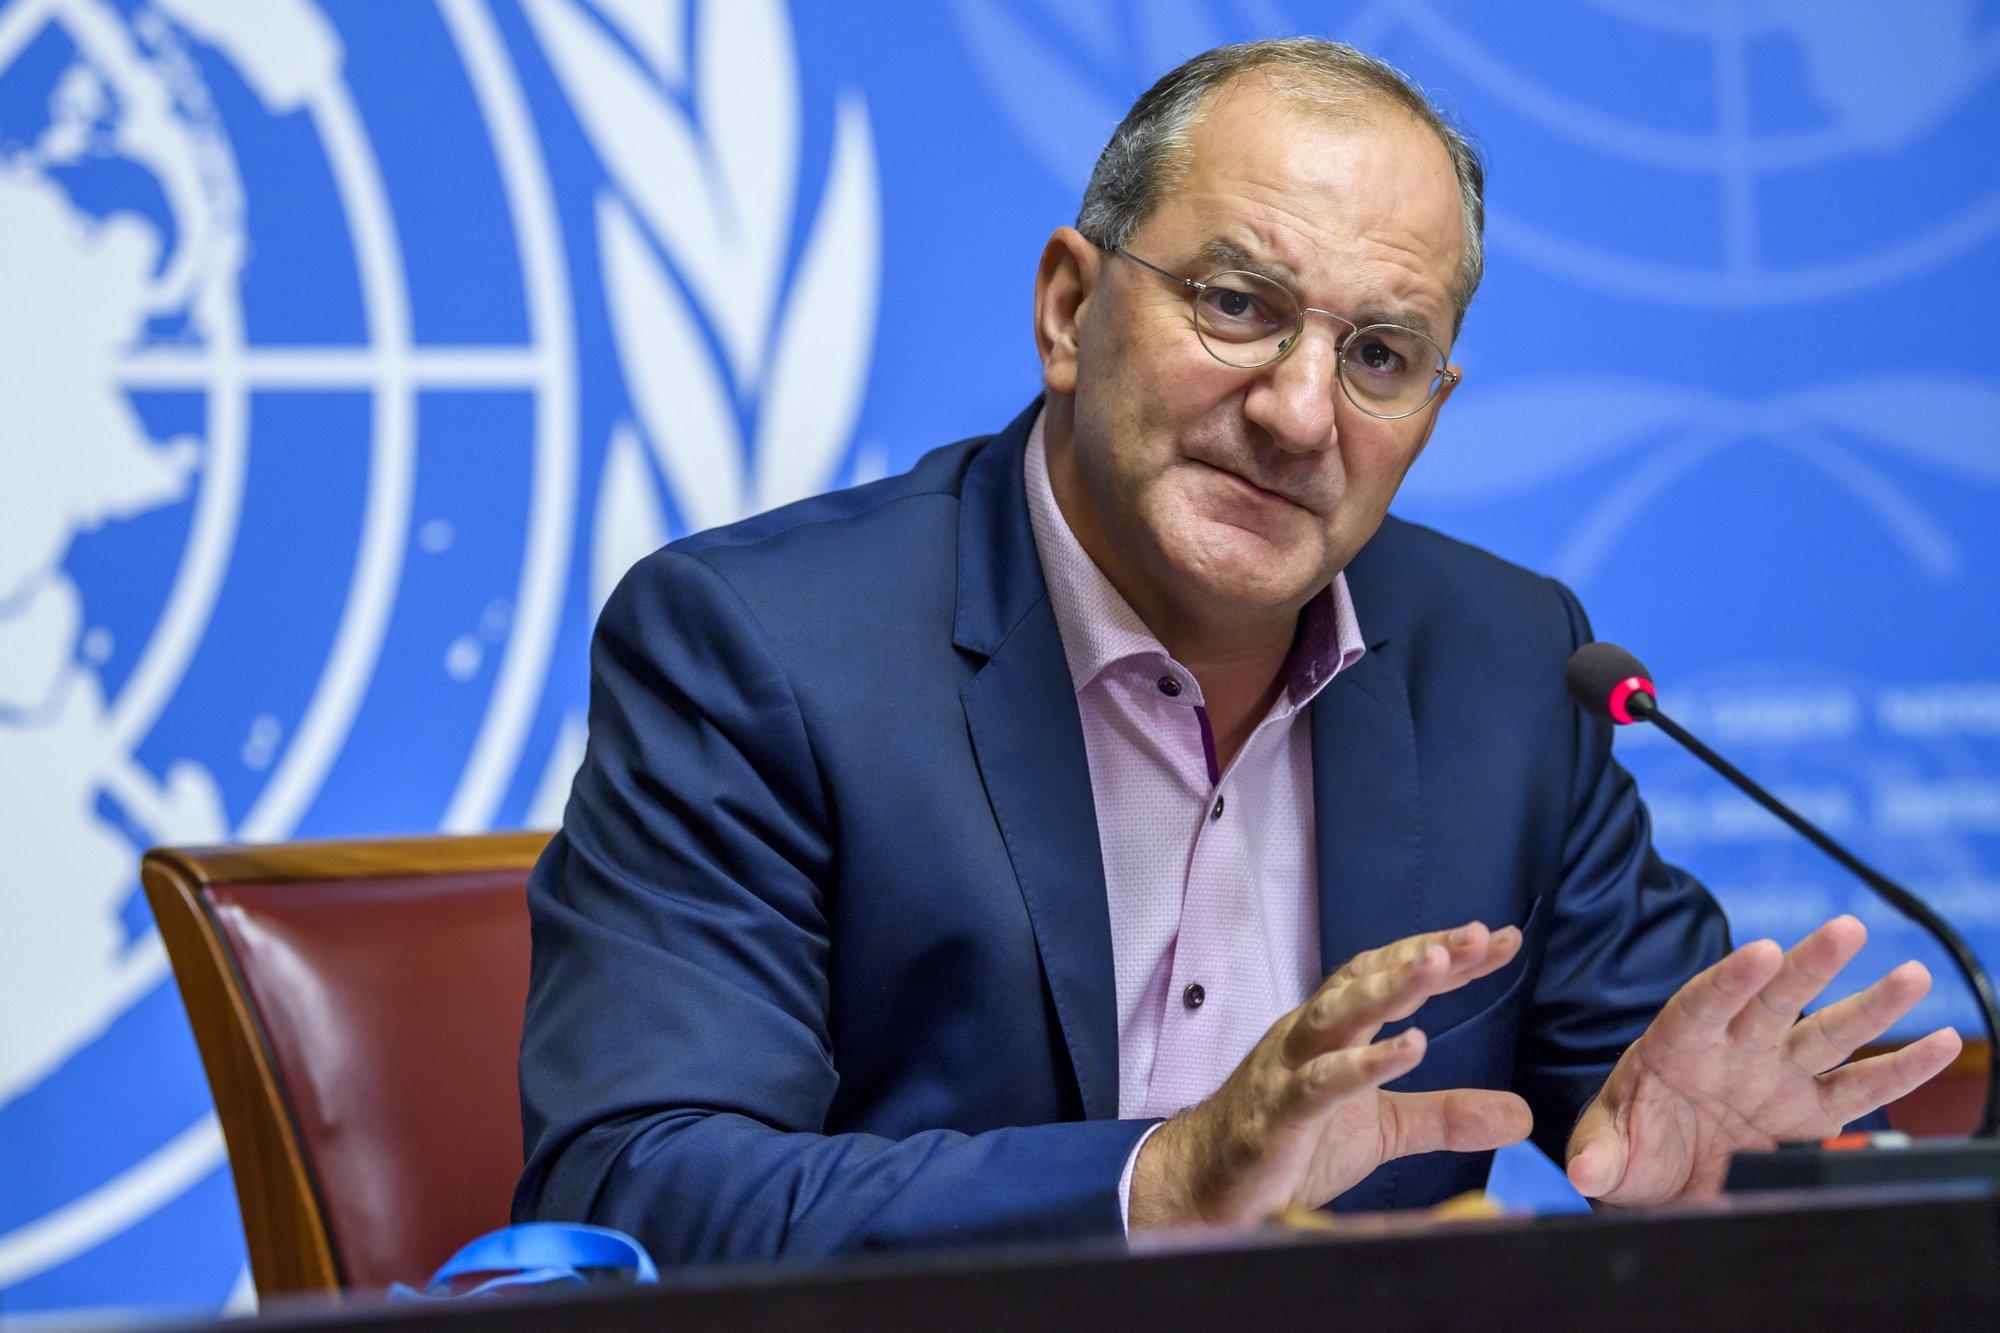 Congo: 2 who received experimental Ebola treatment recover